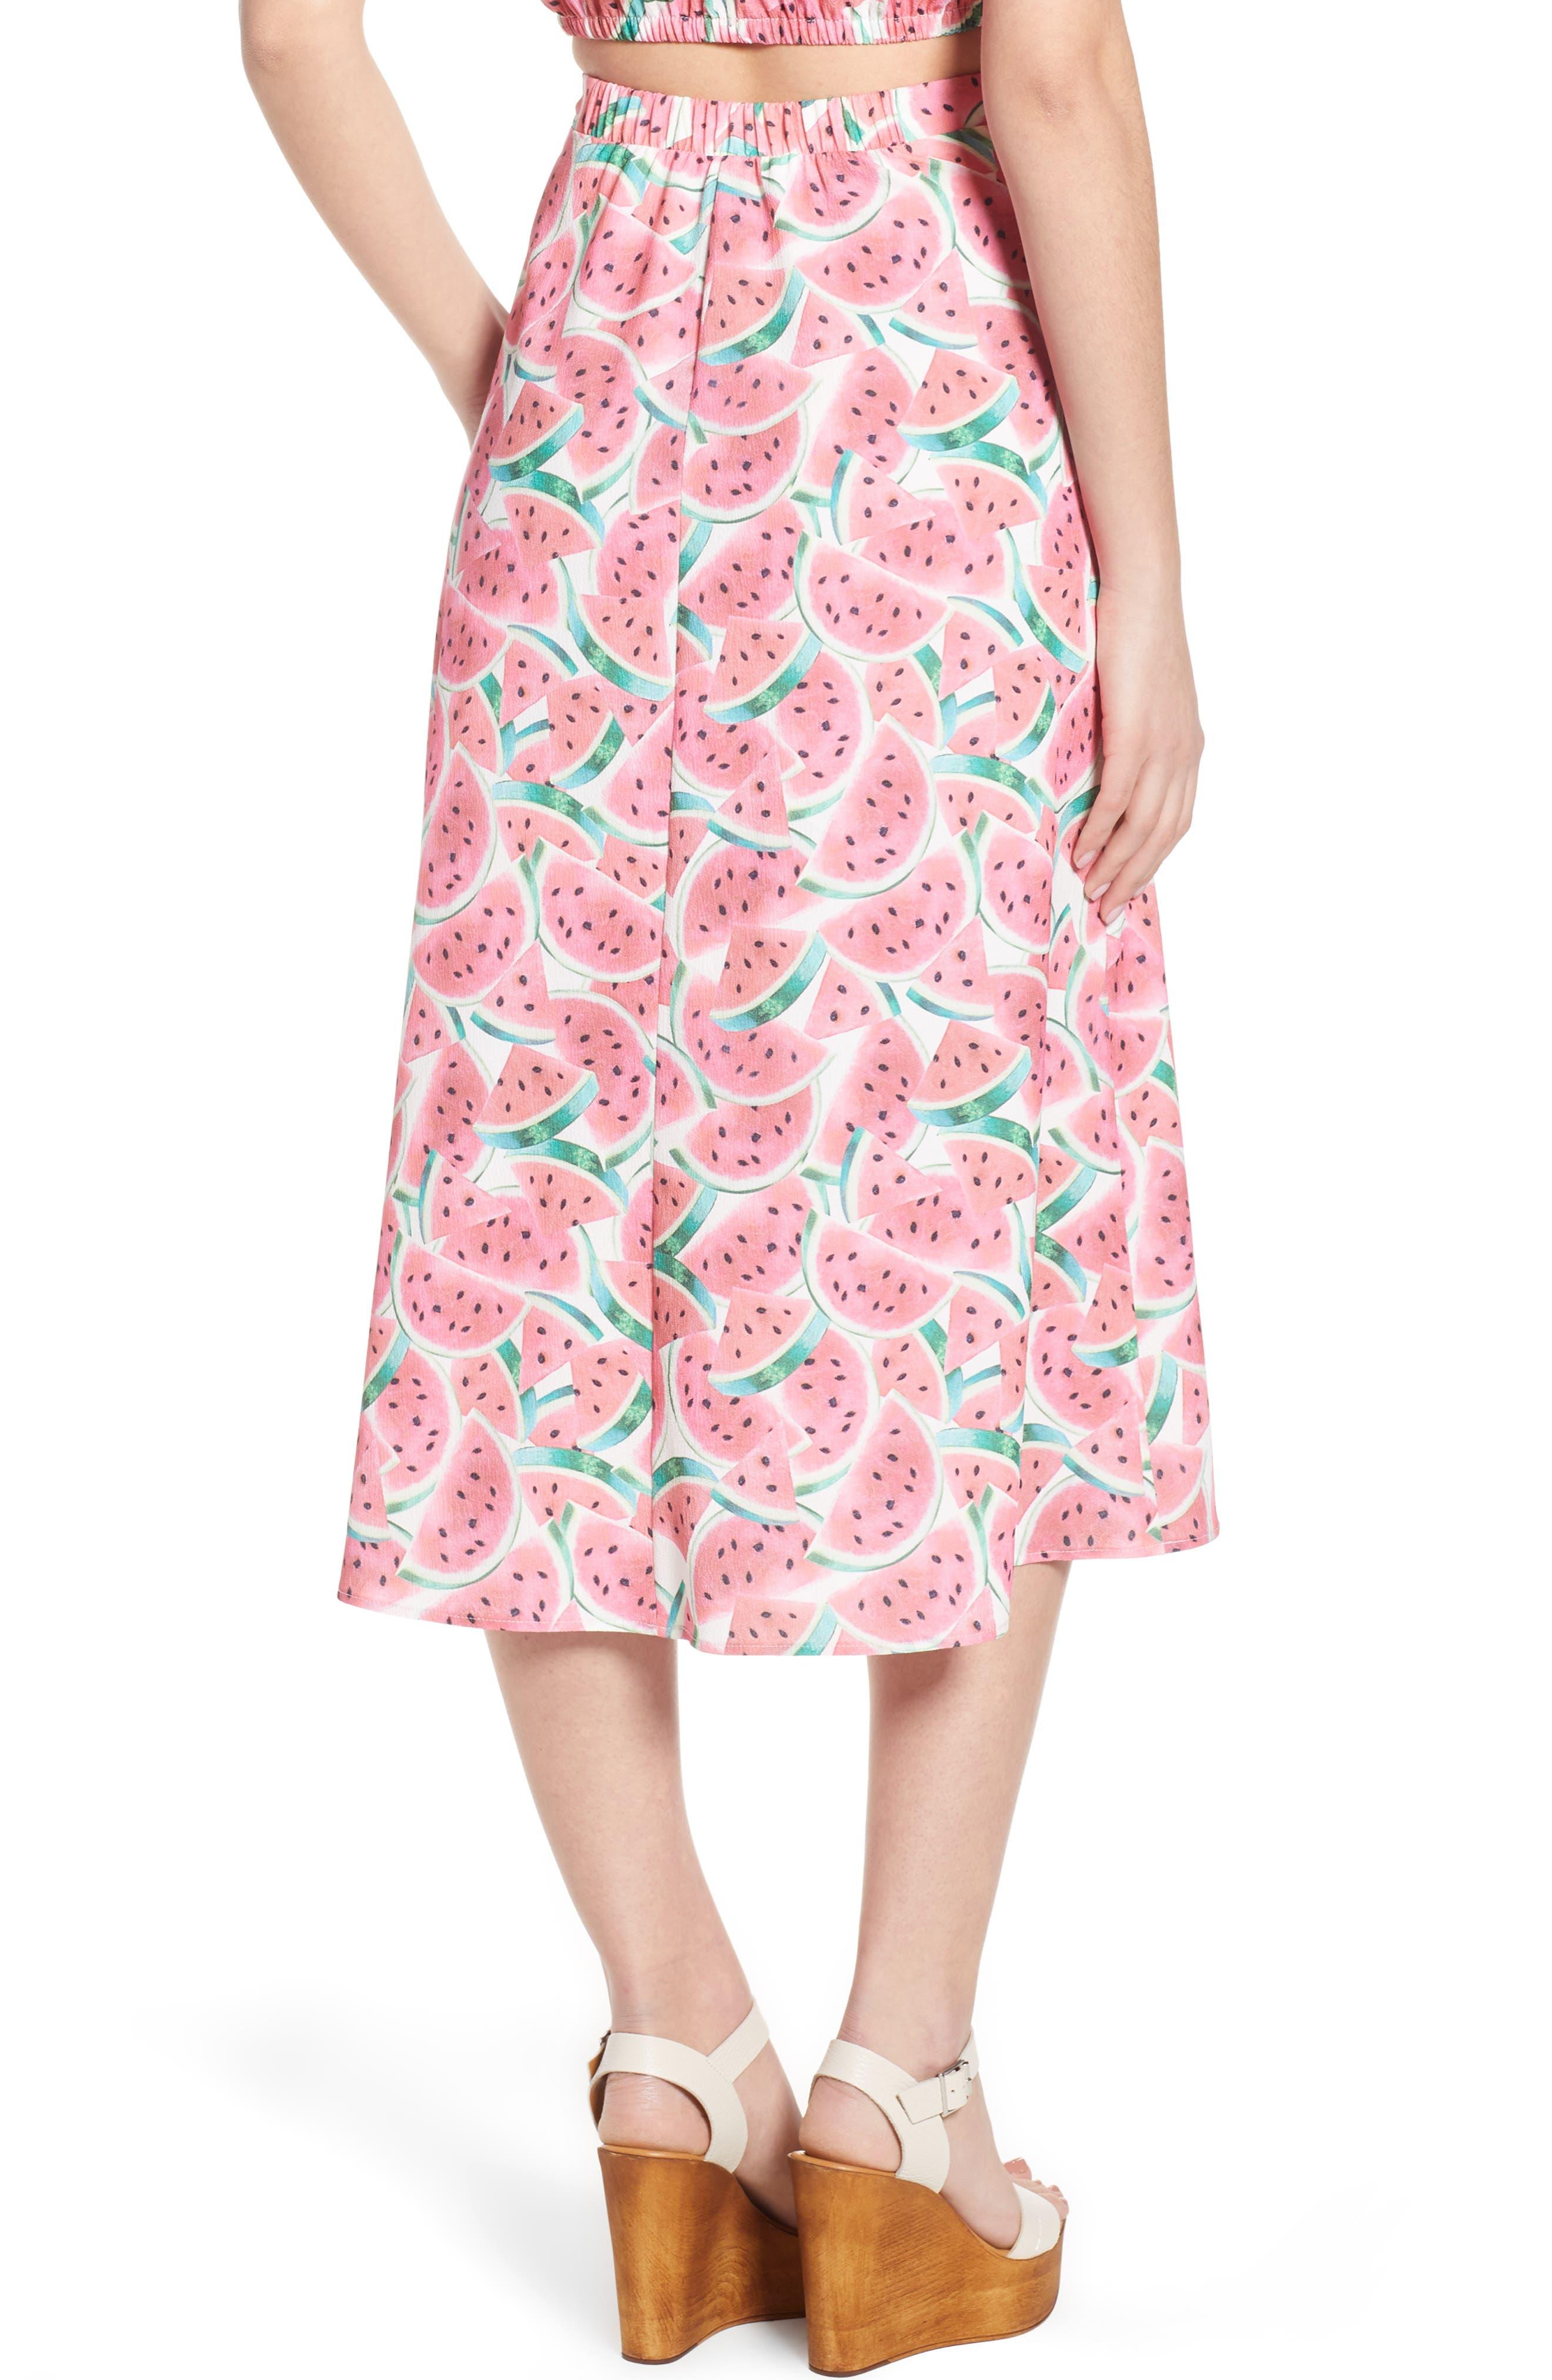 Flirt Midi Skirt,                             Alternate thumbnail 4, color,                             One In A Melon Crinkle Stretch